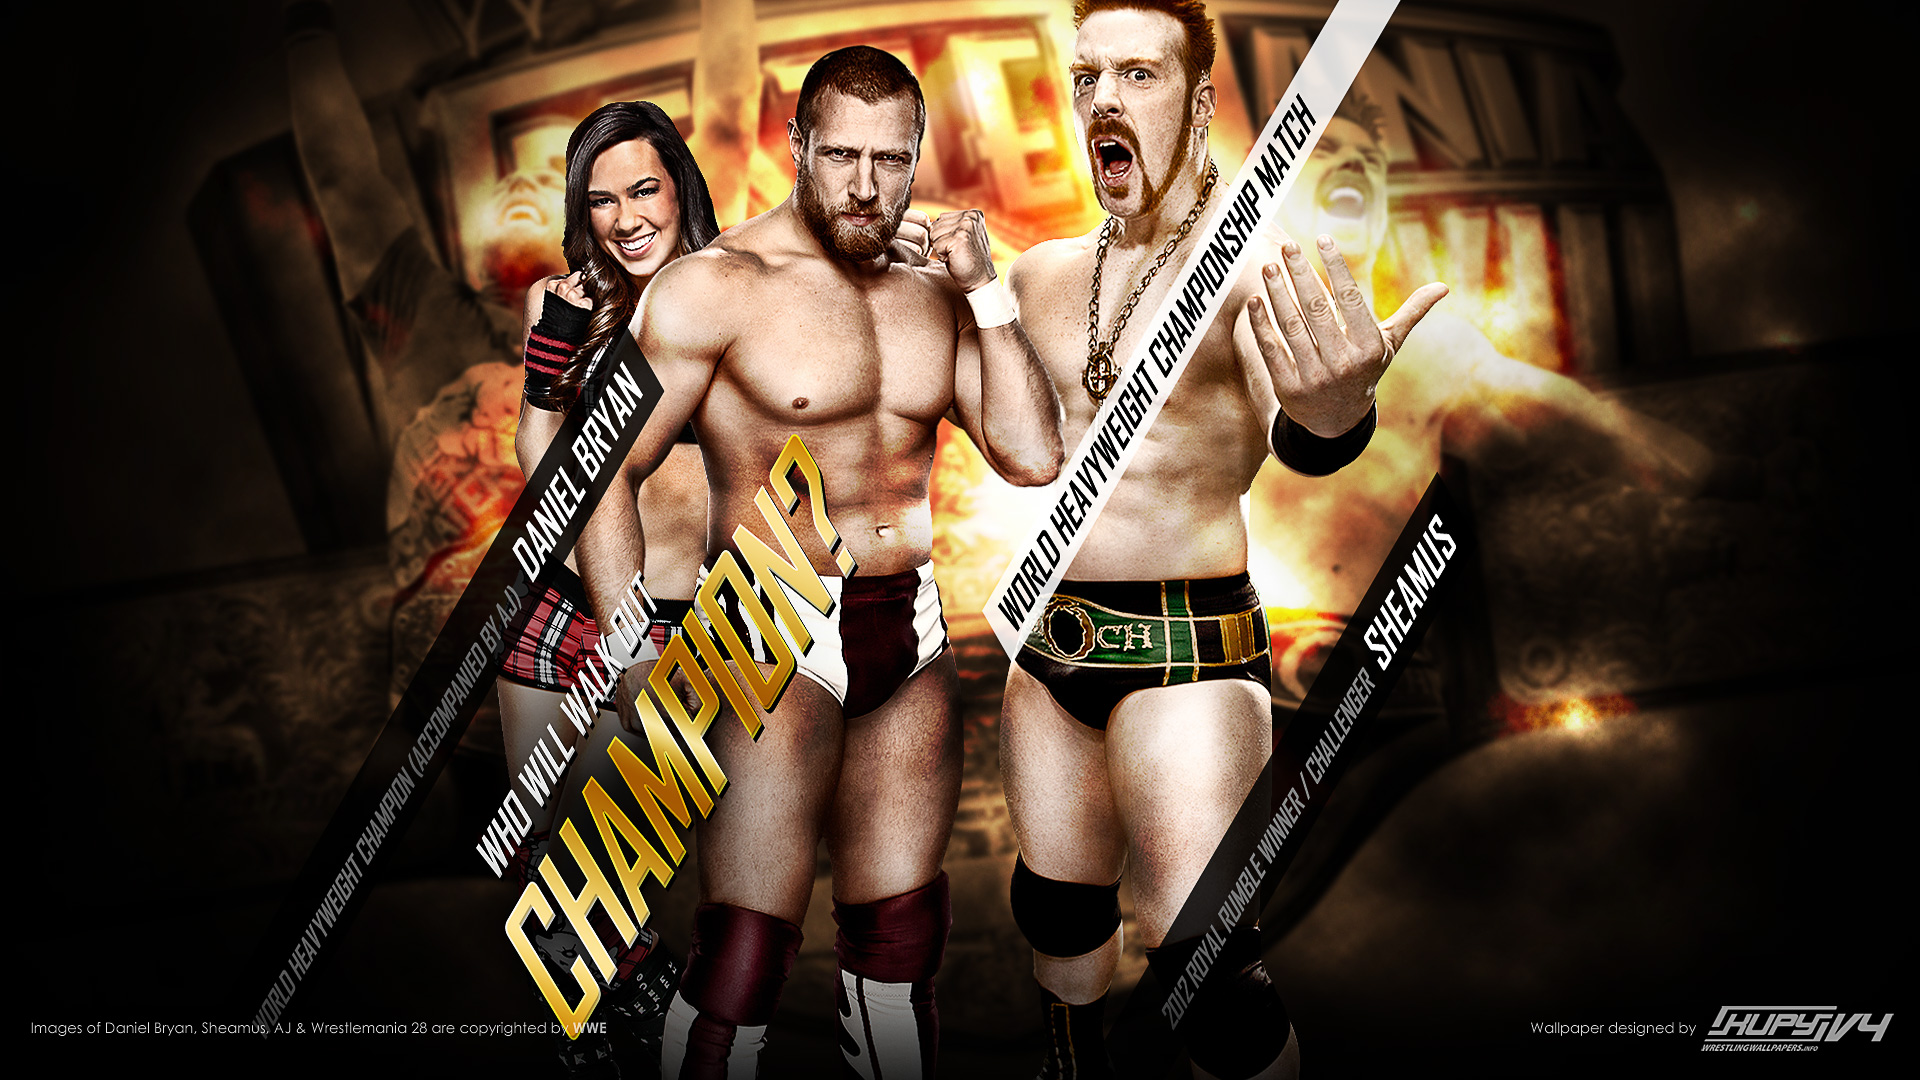 Sheamus vs Daniel Bryan c with AJ WrestleMania 28 WWE wallpaper 1920x1080